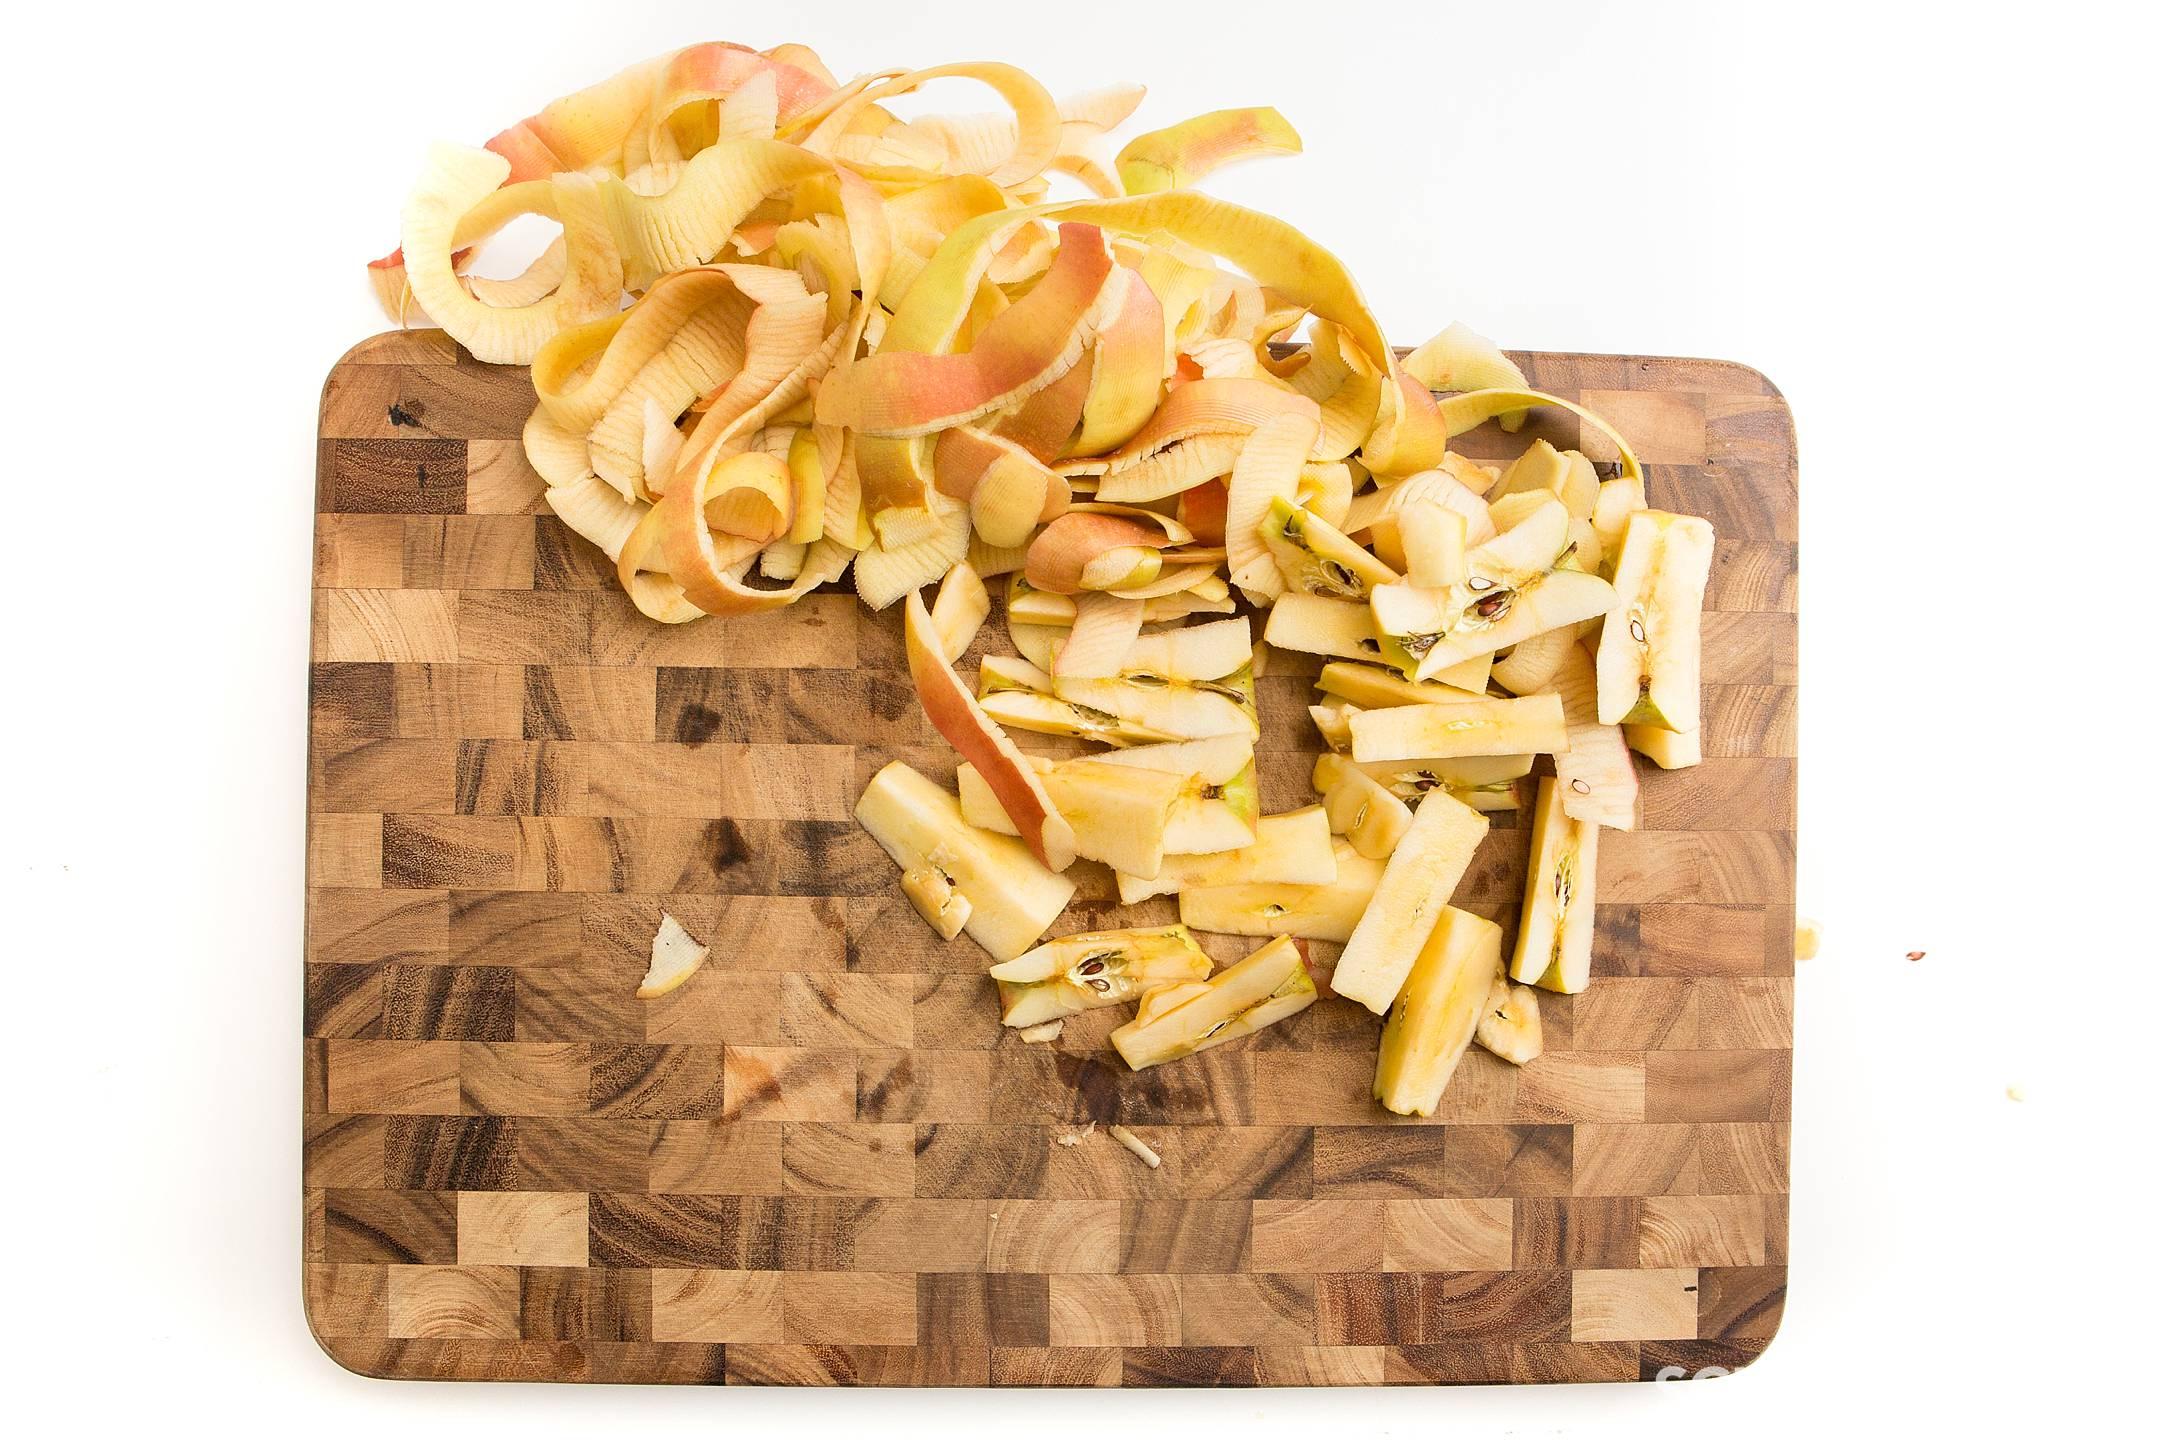 applesauce-homemade-easy-eat-with-tom-foodblog-schmidt-photo_2102